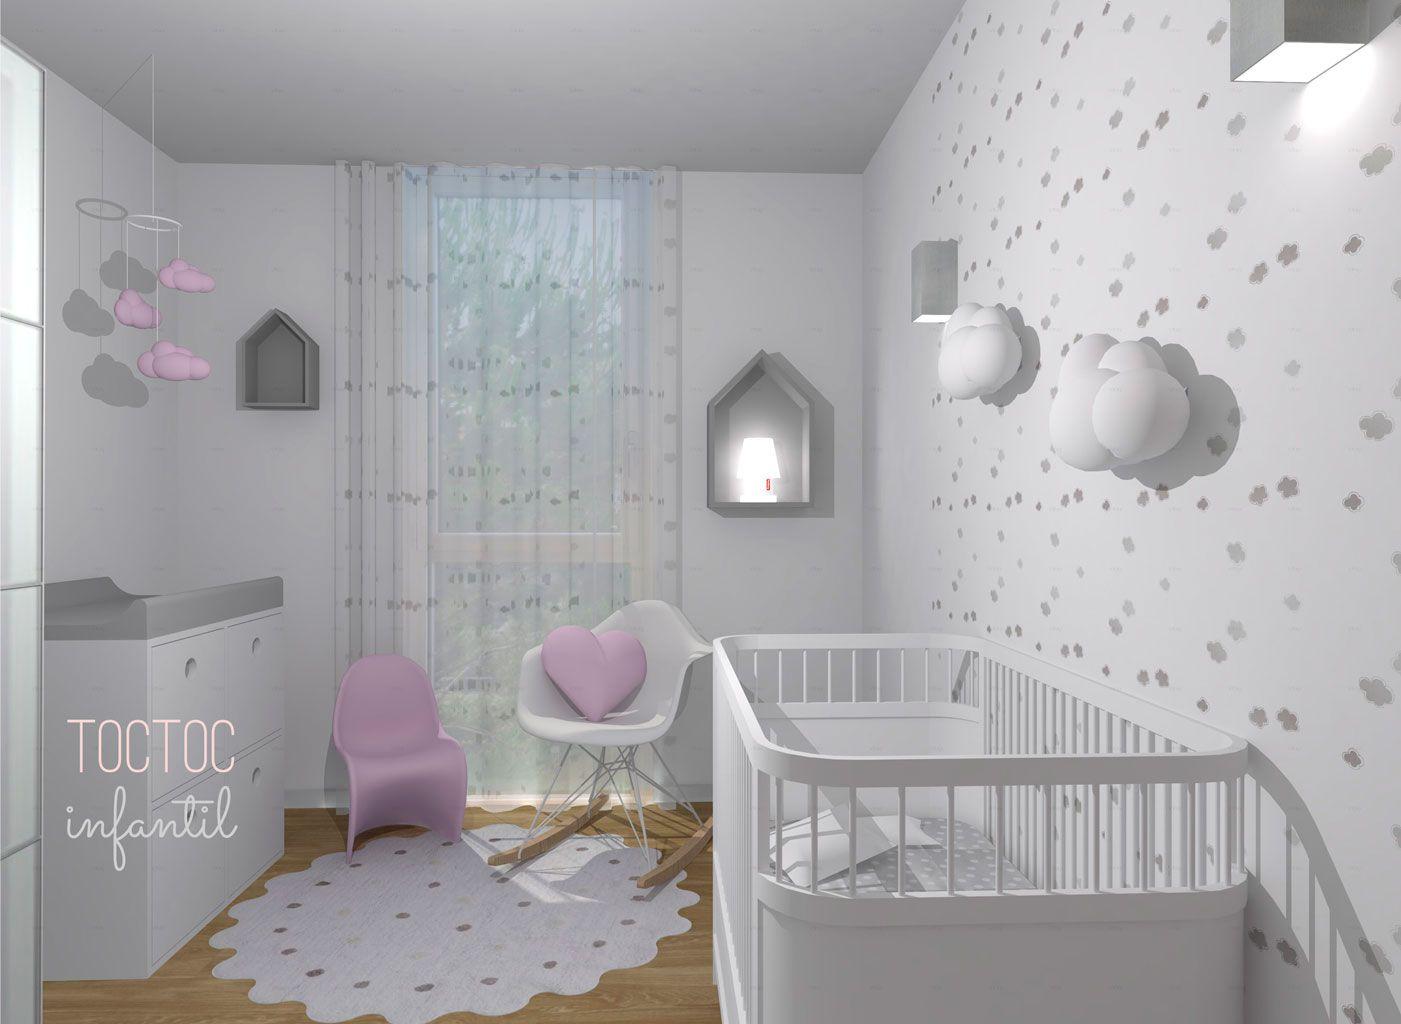 Pinceladas de rosa toc toc infantil hab pinceladas de for Programa para decorar habitaciones online